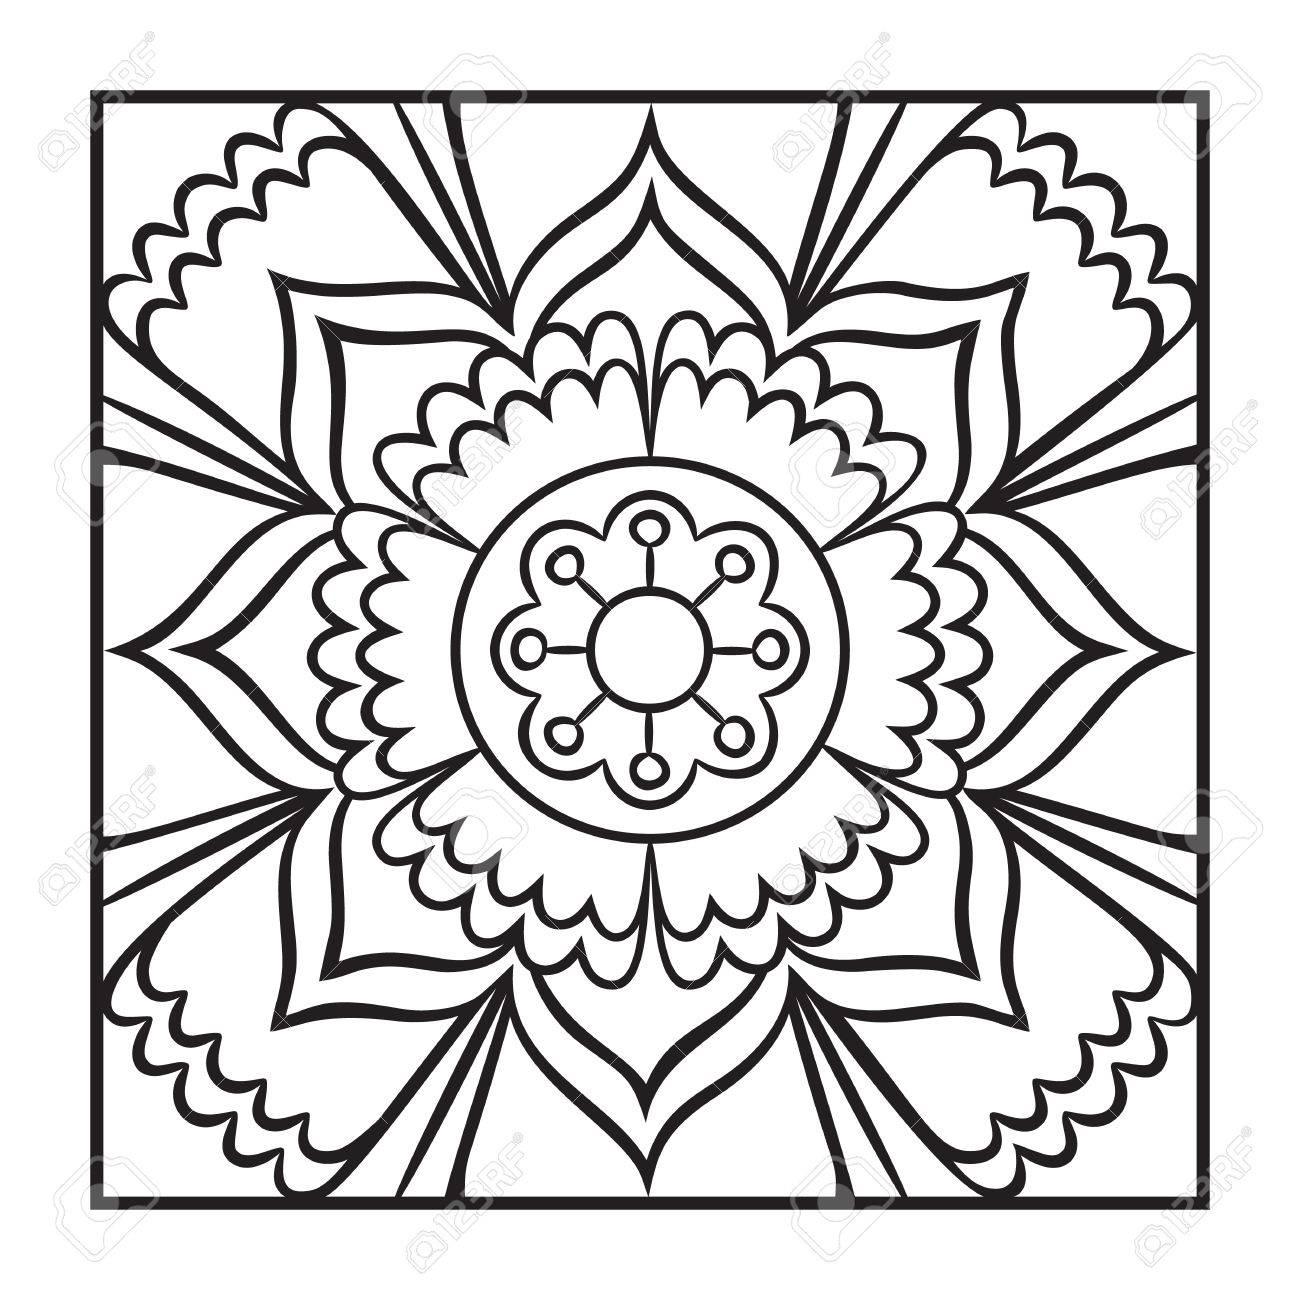 Doodle mandala coloring page. Outline floral design element...